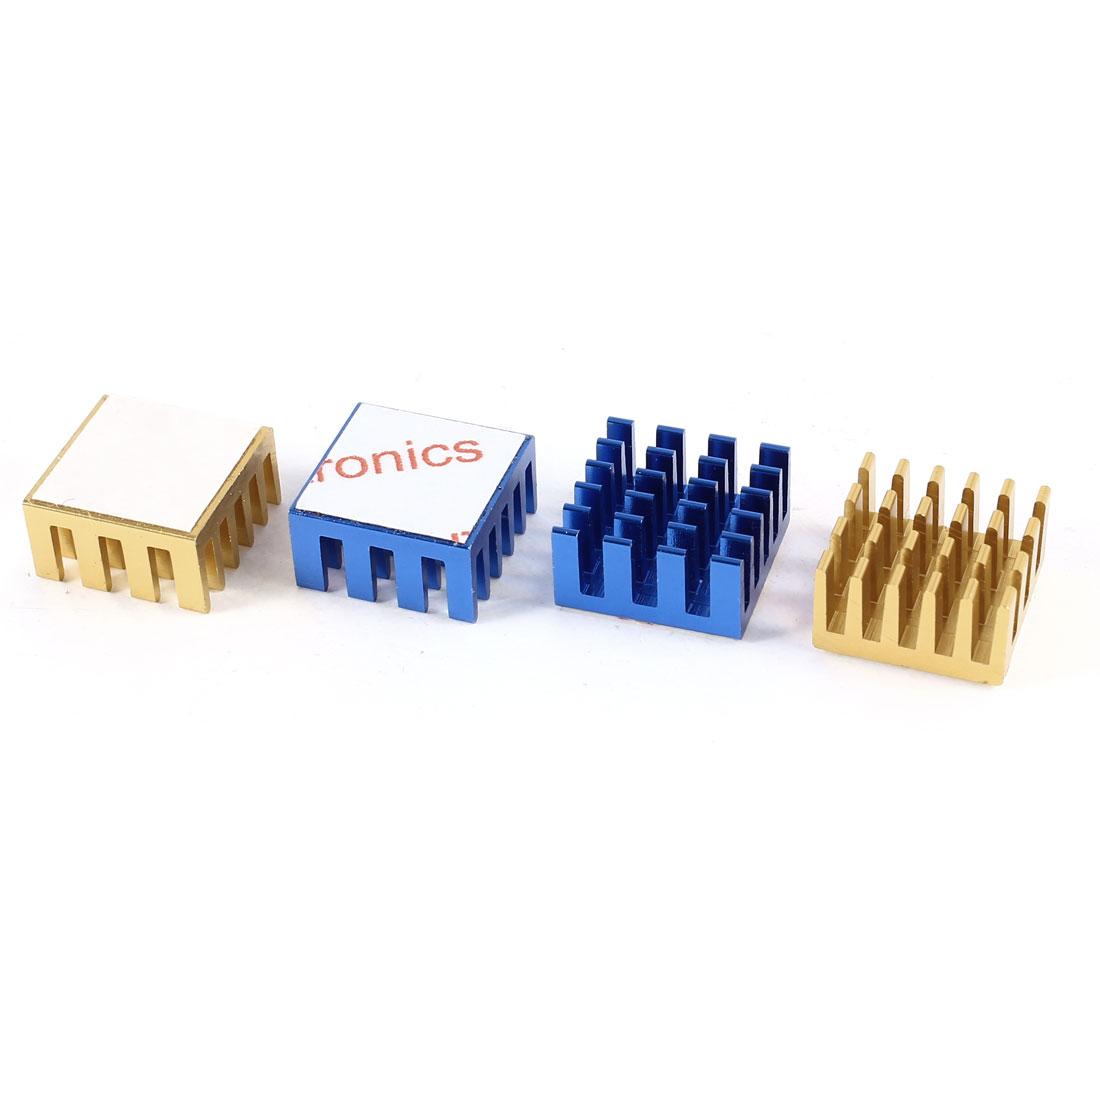 4 Pcs Aluminum Heatsinks Radiator Cooling Fin Cooler 15x15x8mm Blue Copper Tone